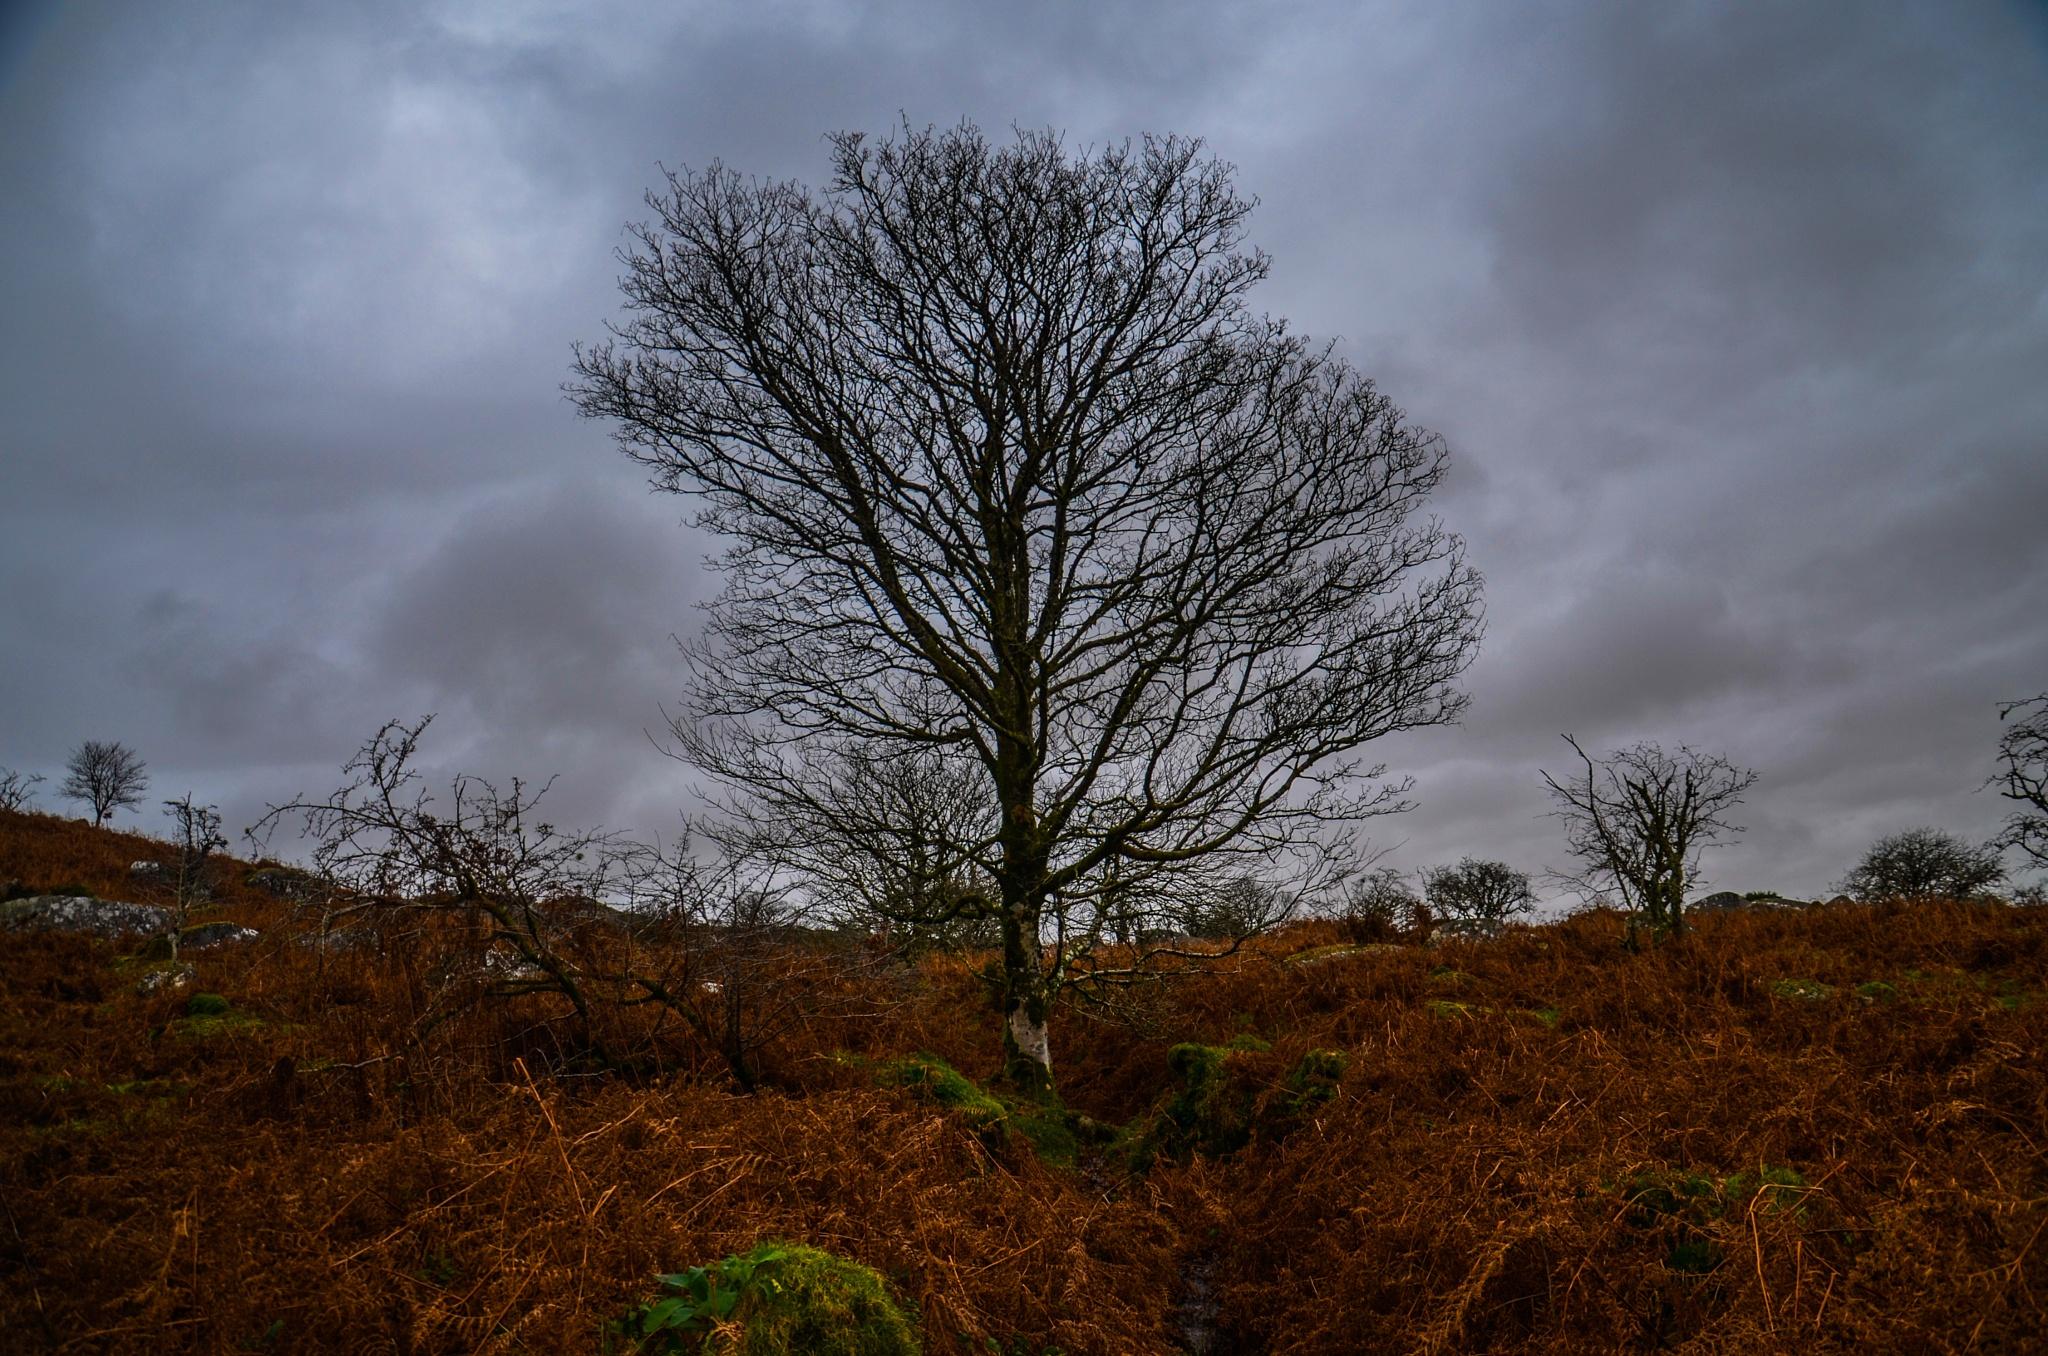 Dartmoor in the rain by johncedriccoles123